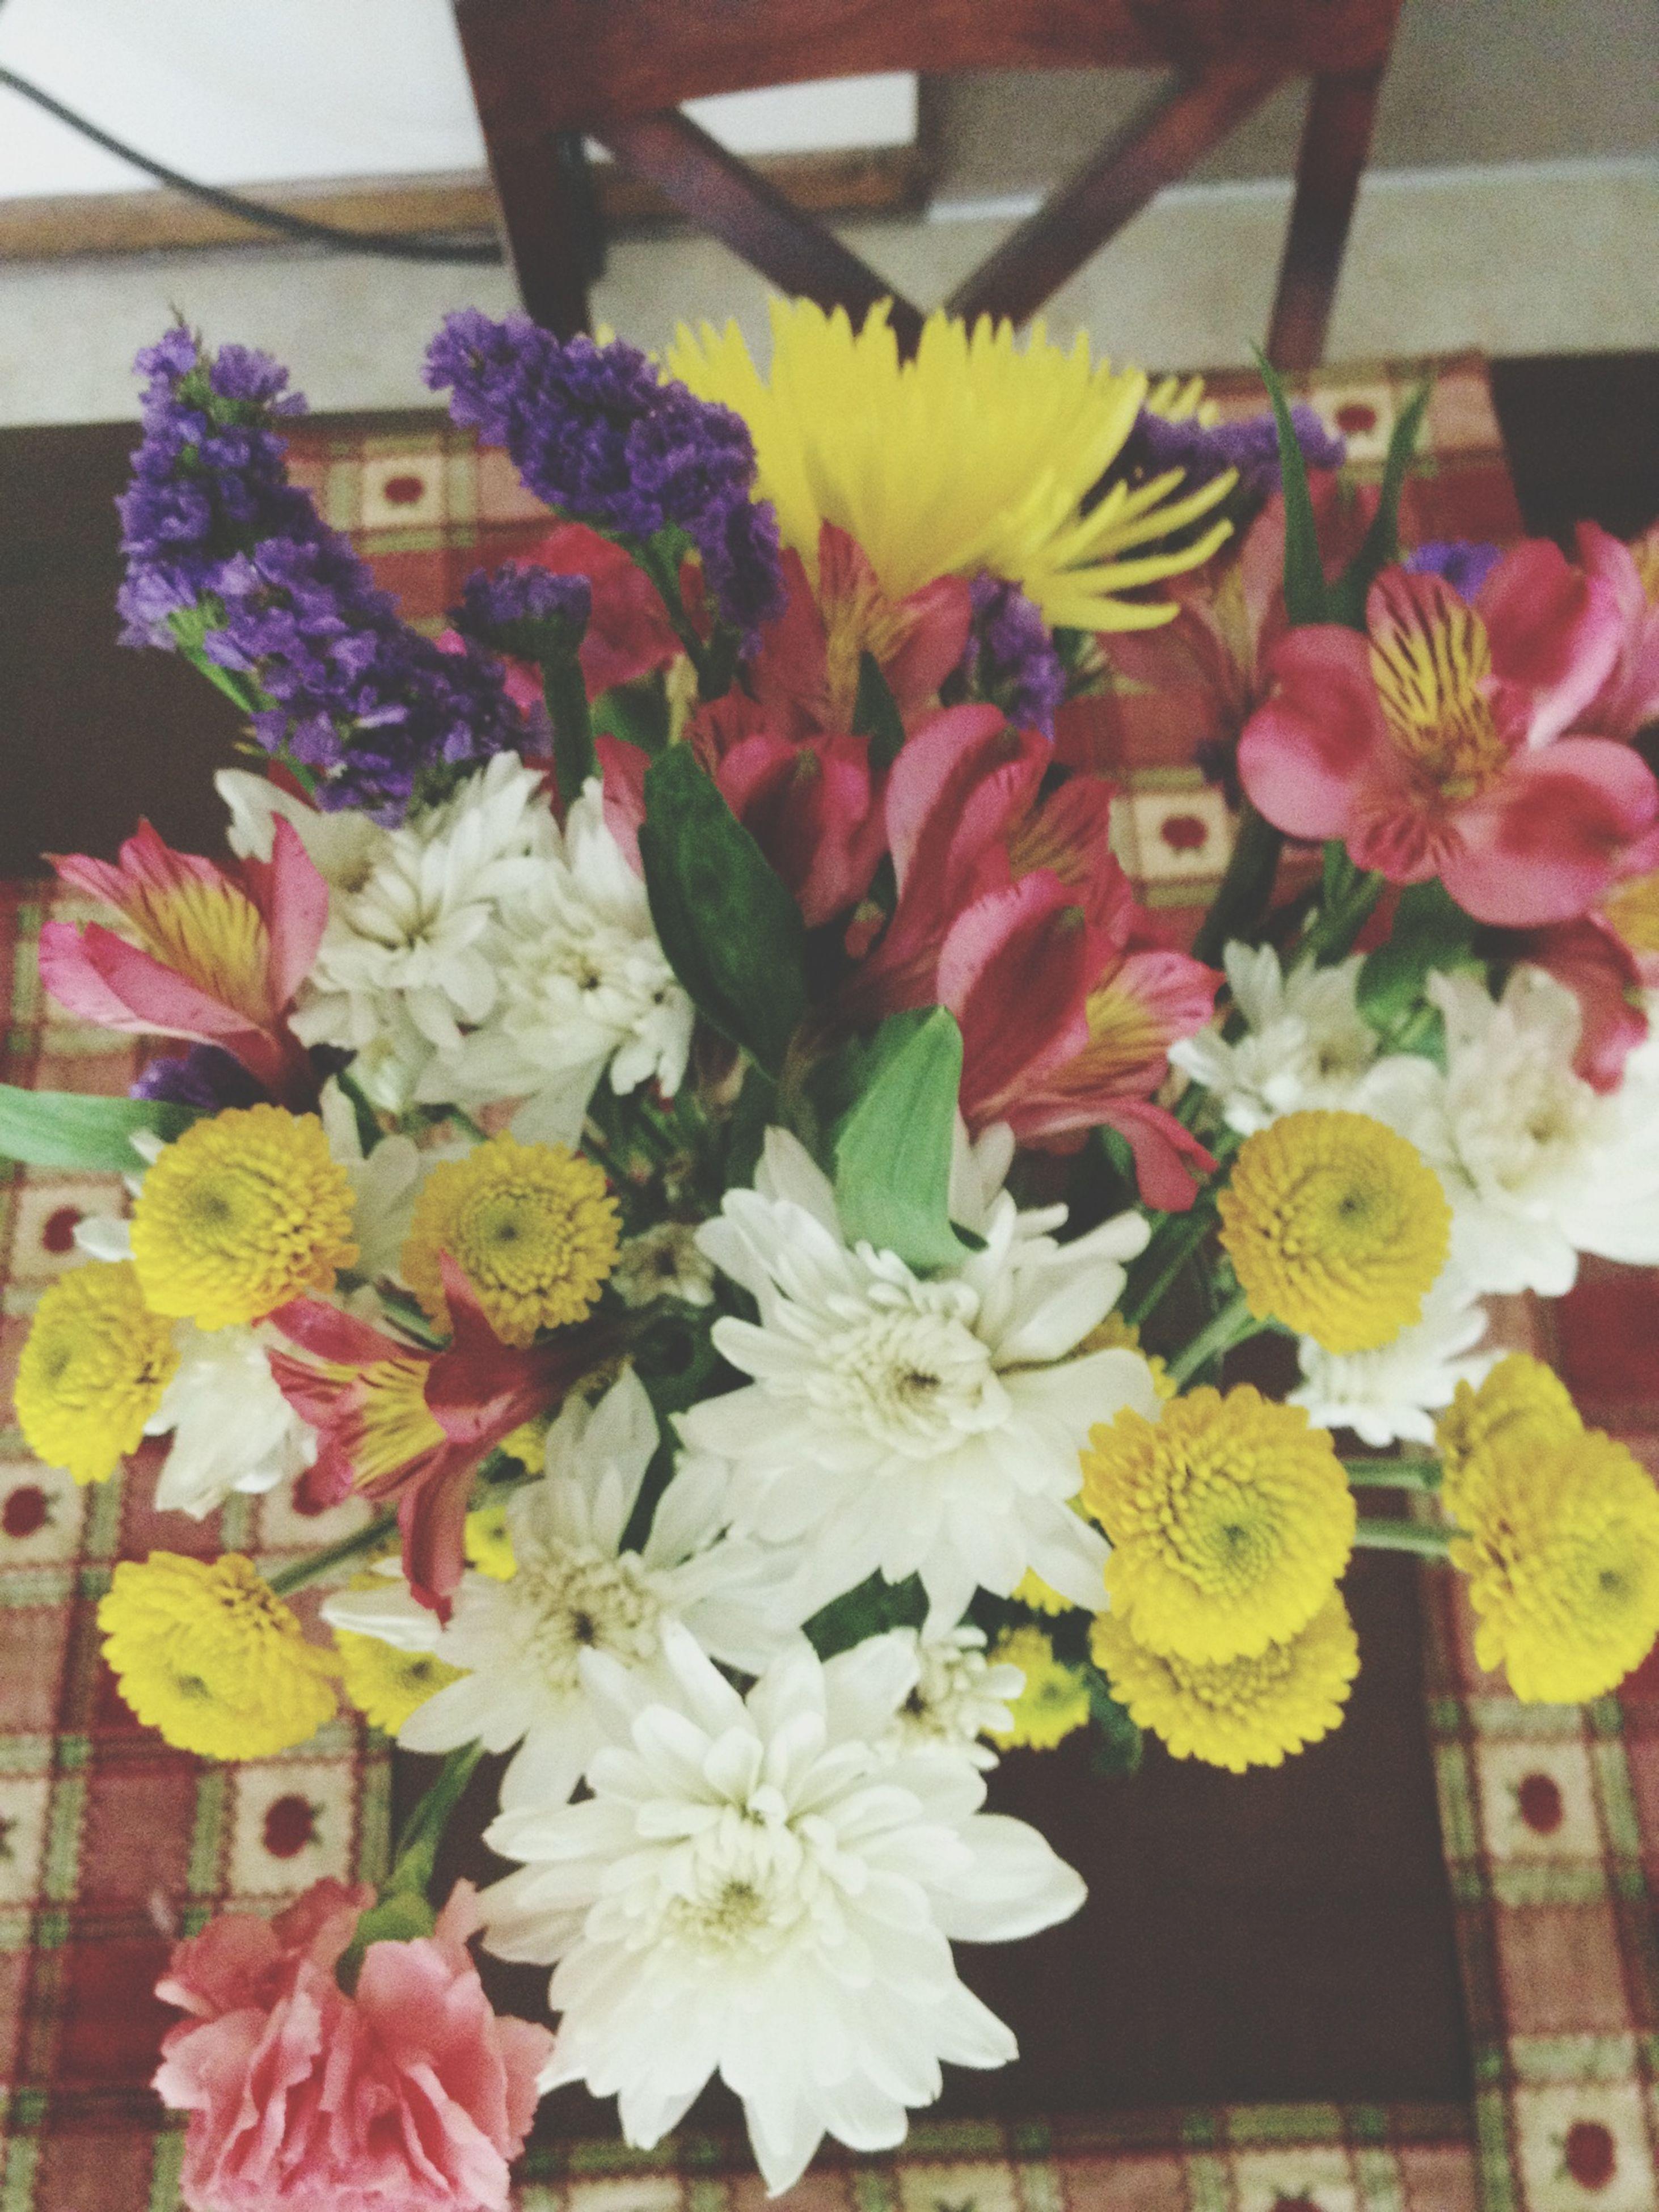 flower, freshness, fragility, petal, indoors, bouquet, variation, flower head, multi colored, bunch of flowers, flower arrangement, abundance, decoration, beauty in nature, vase, high angle view, arrangement, nature, close-up, blooming